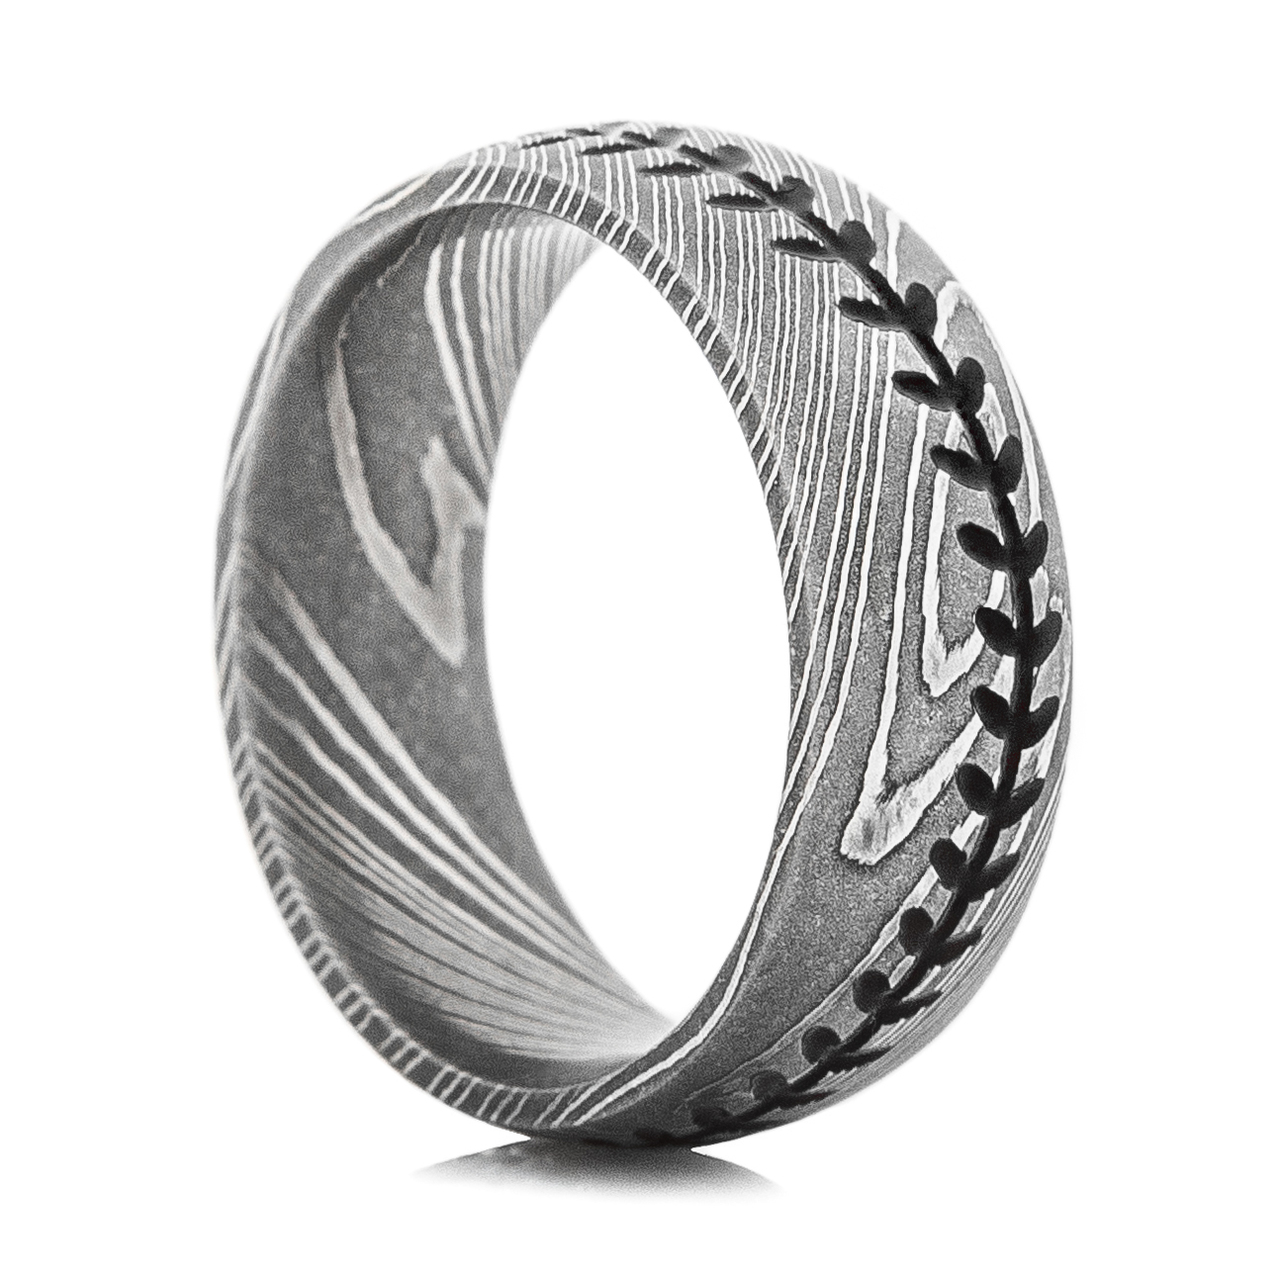 Men\'s Damascus Steel Baseball Stitch Ring - Titanium-Buzz